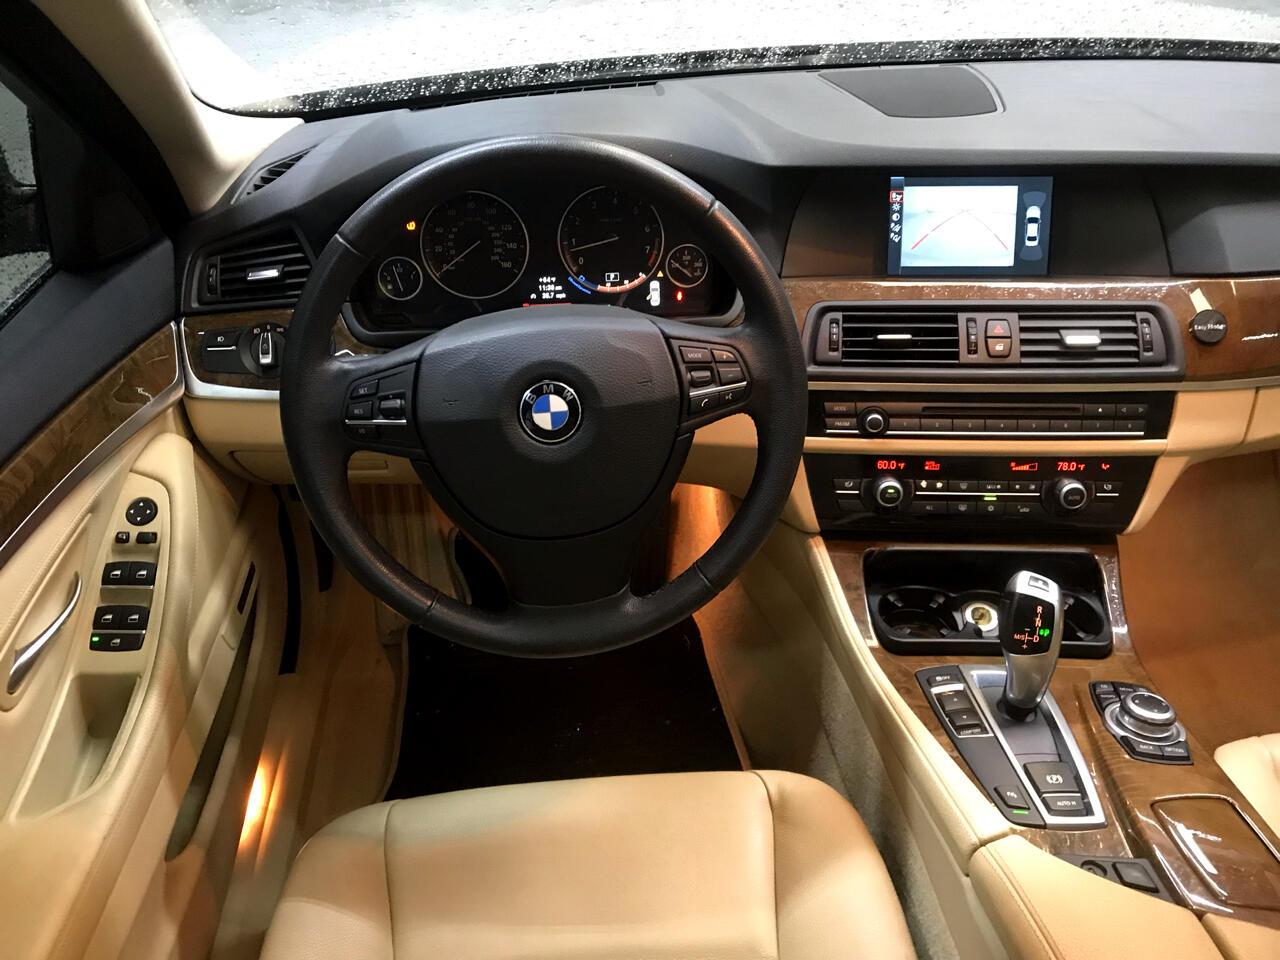 2012 BMW 5 Series 4dr Sdn 535i RWD